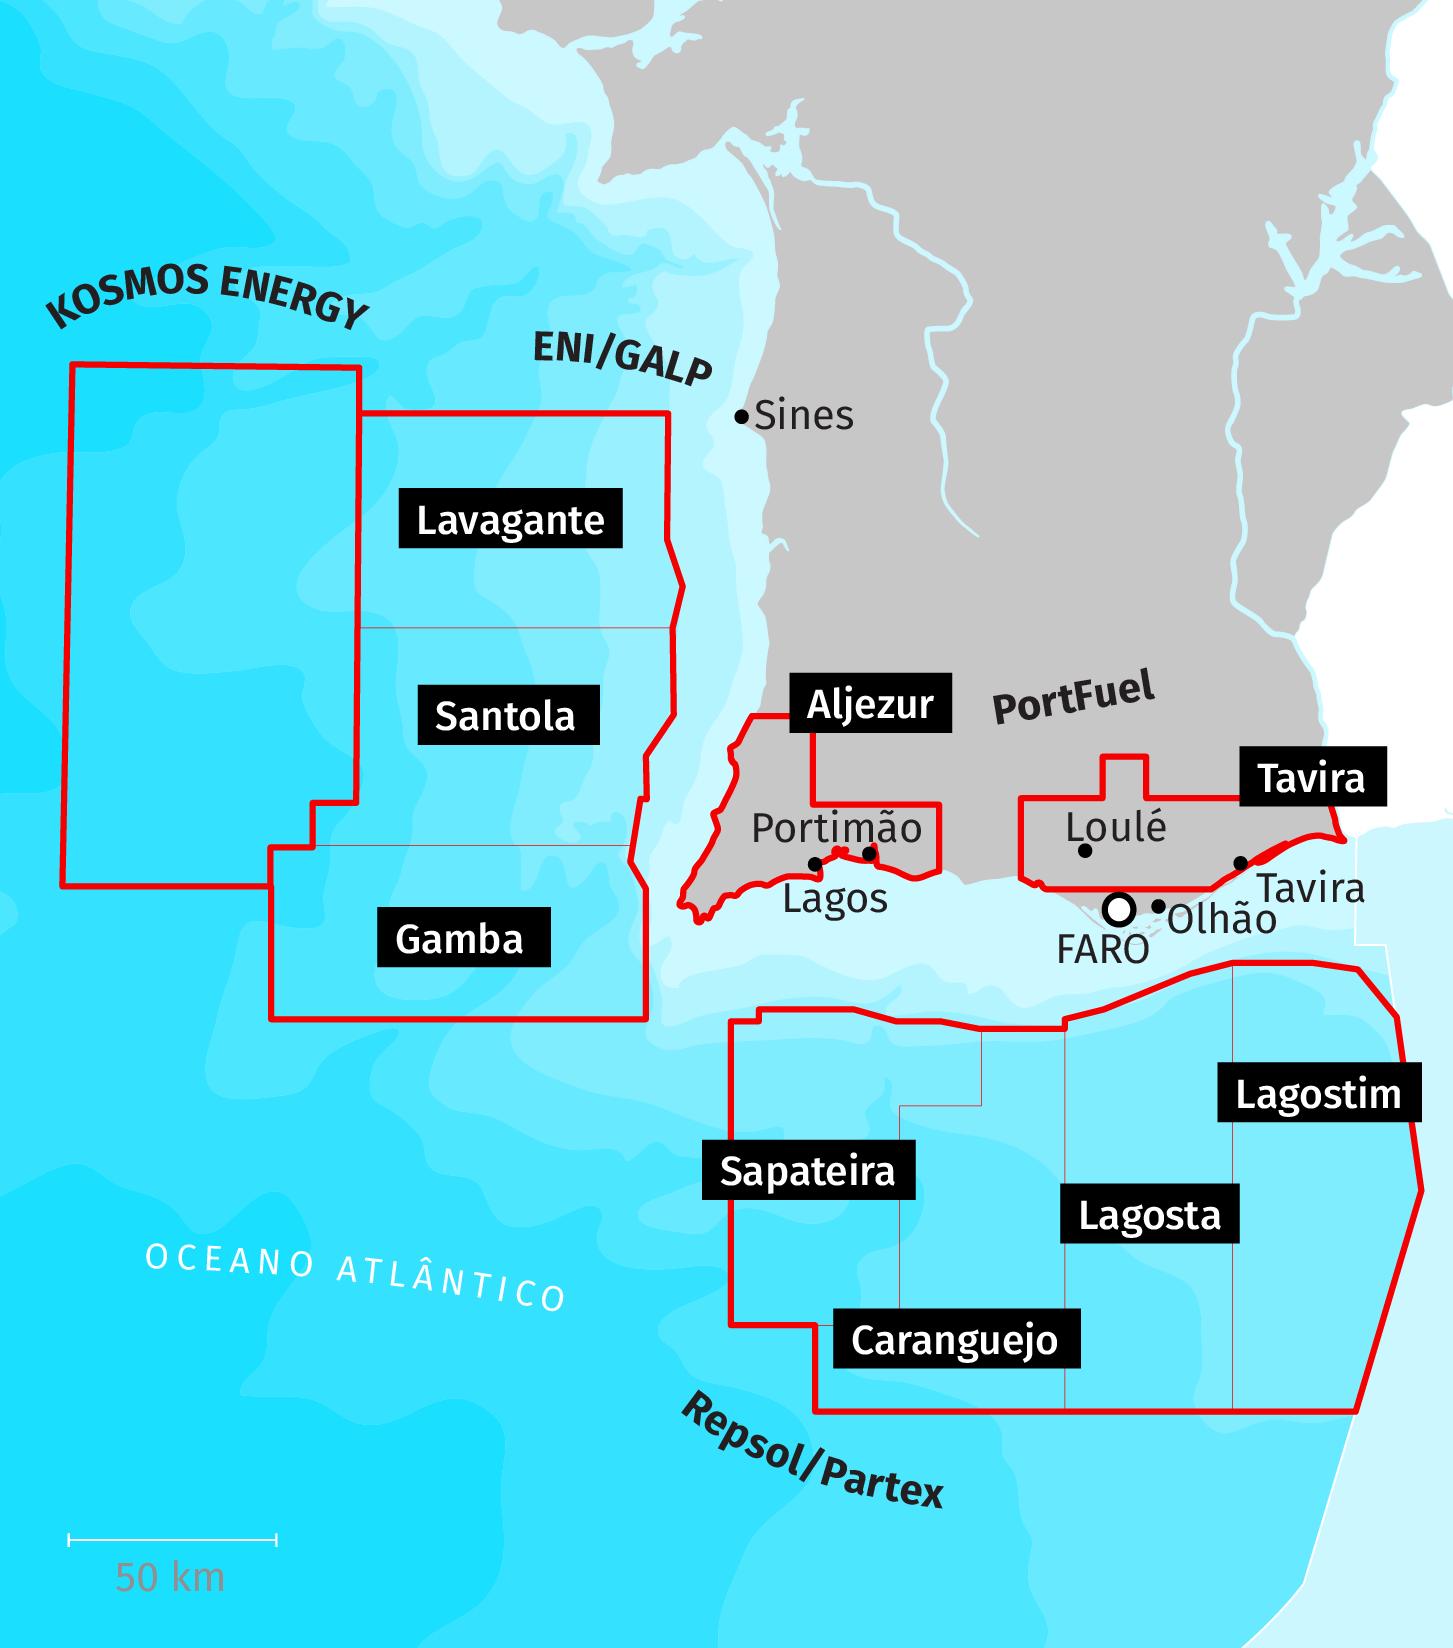 2016dez14_mapa-petroleo-algarve-01